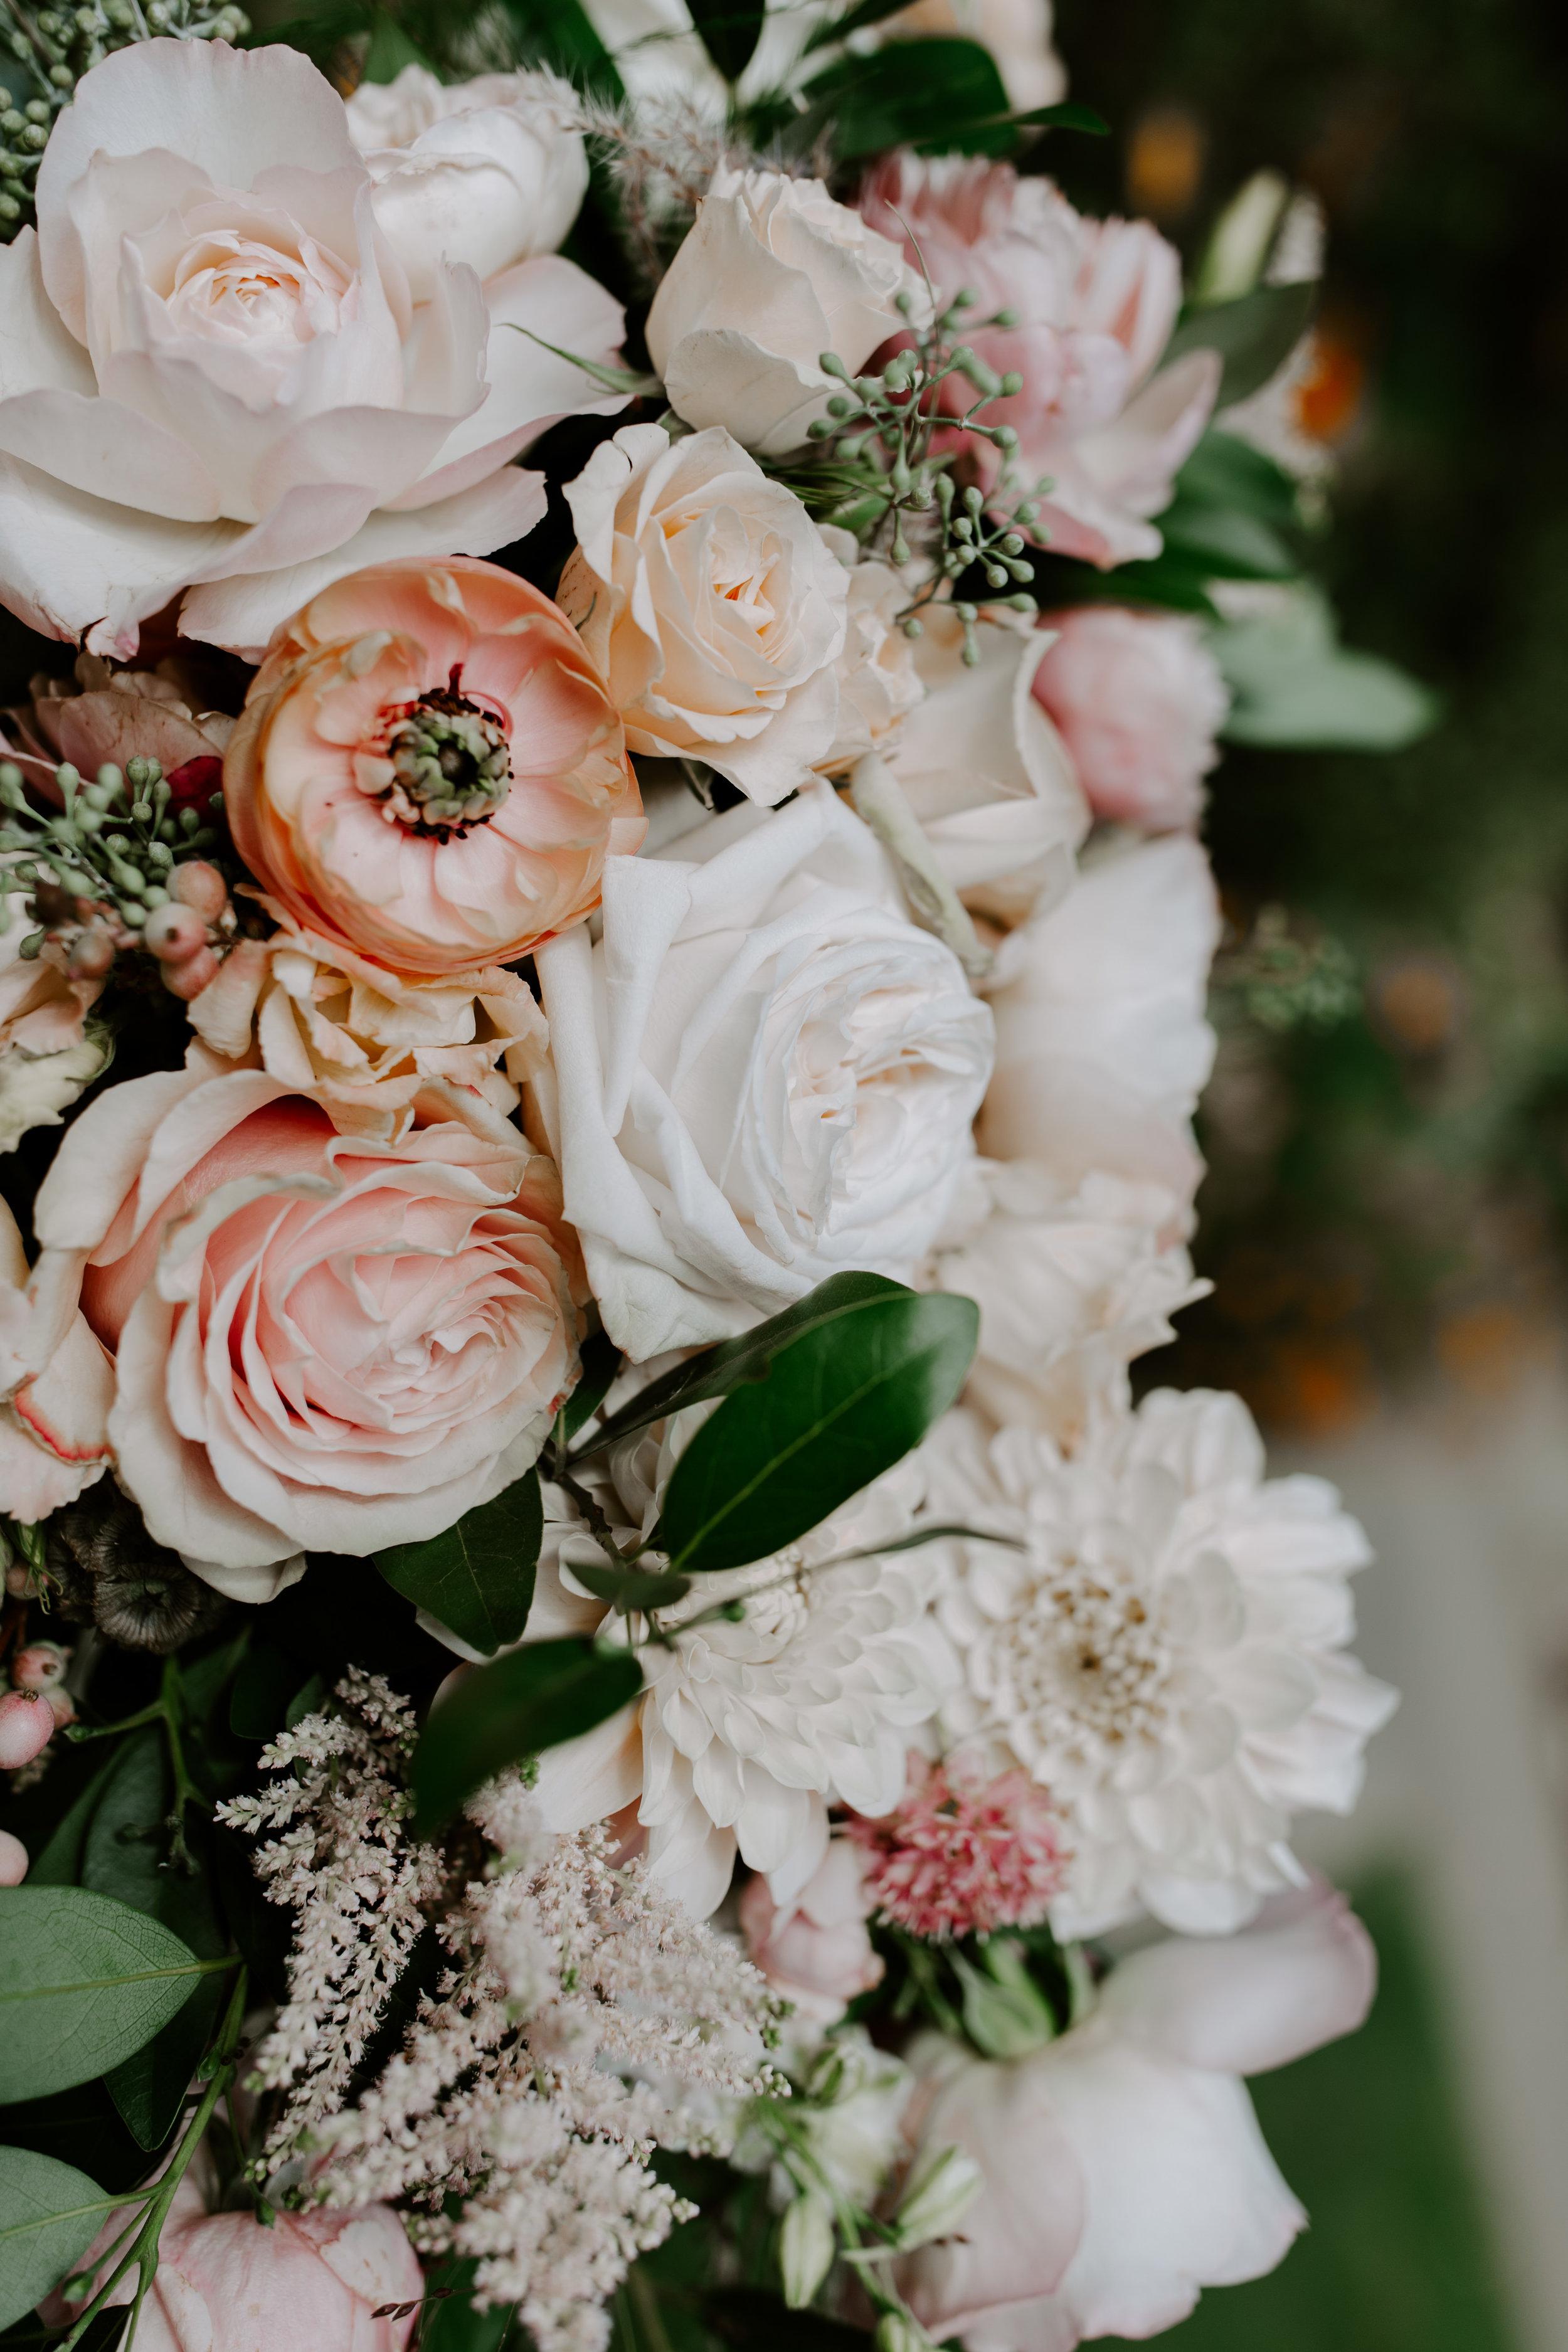 Rustic Bloom Photography | Bridal Bouquet Inspiration | Oregon Wedding Photographer